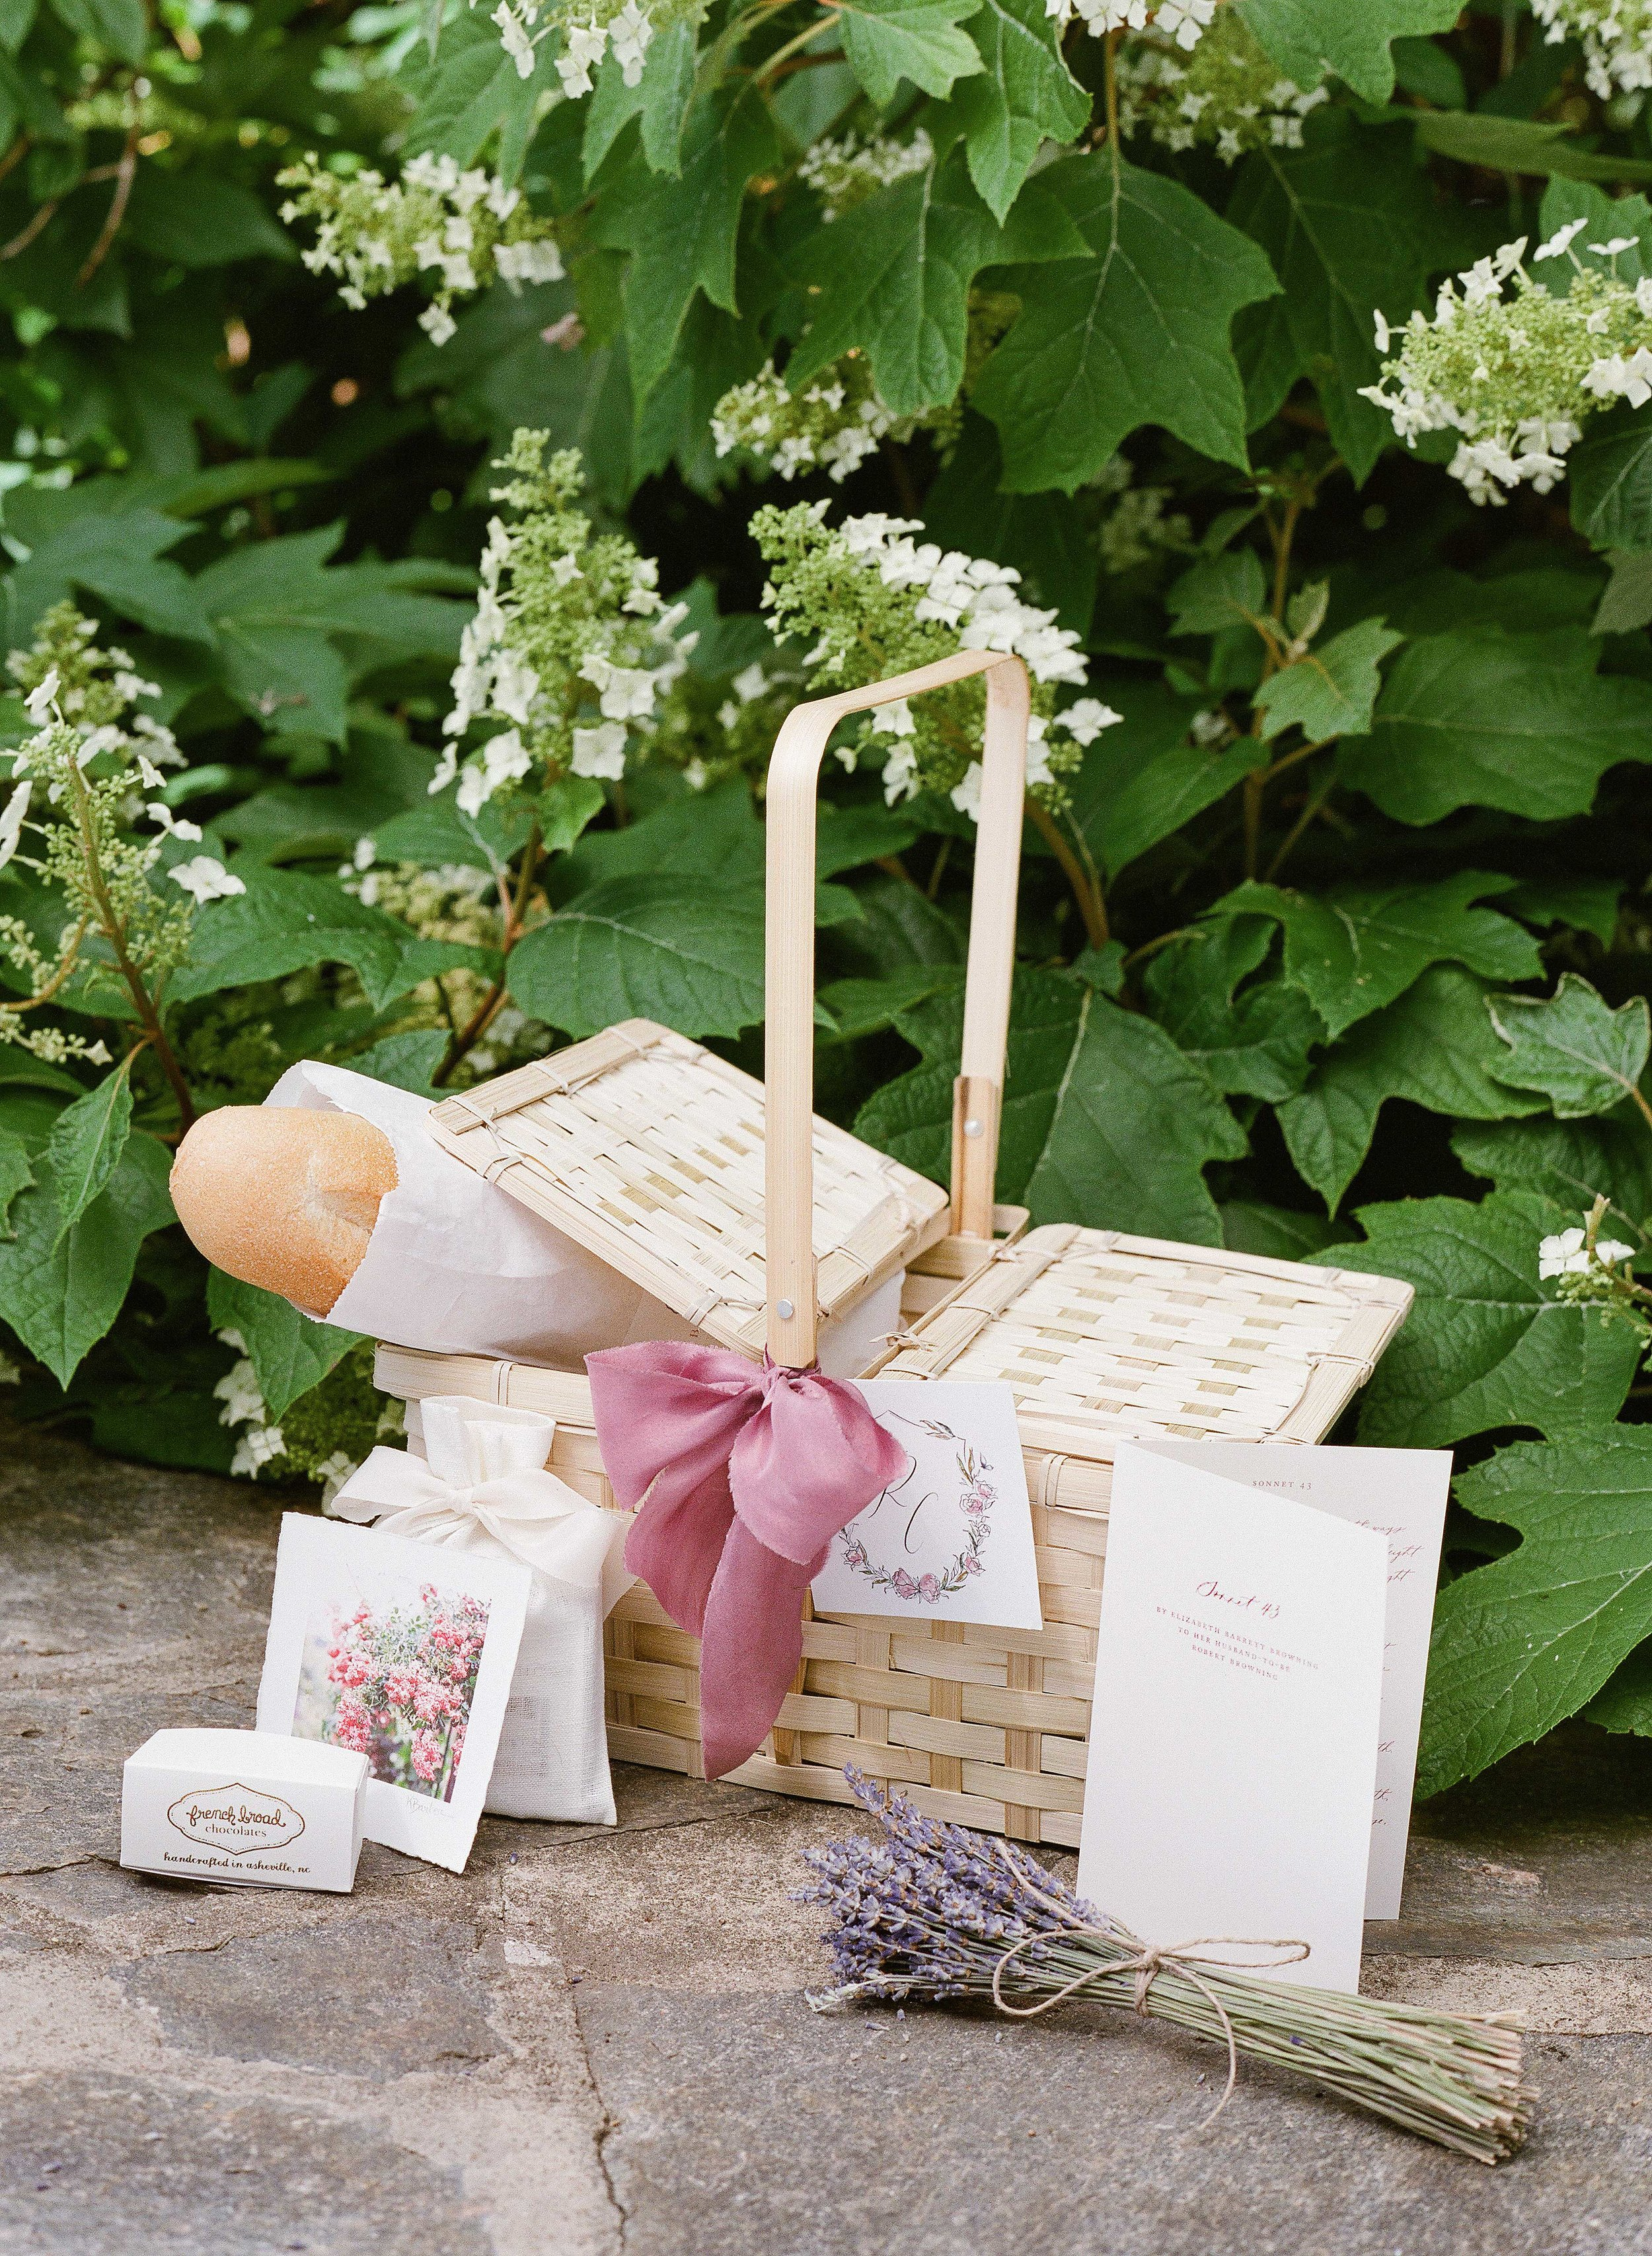 rebecca-clay-wedding-north-carolina-welcome-baskets-103228790.jpg